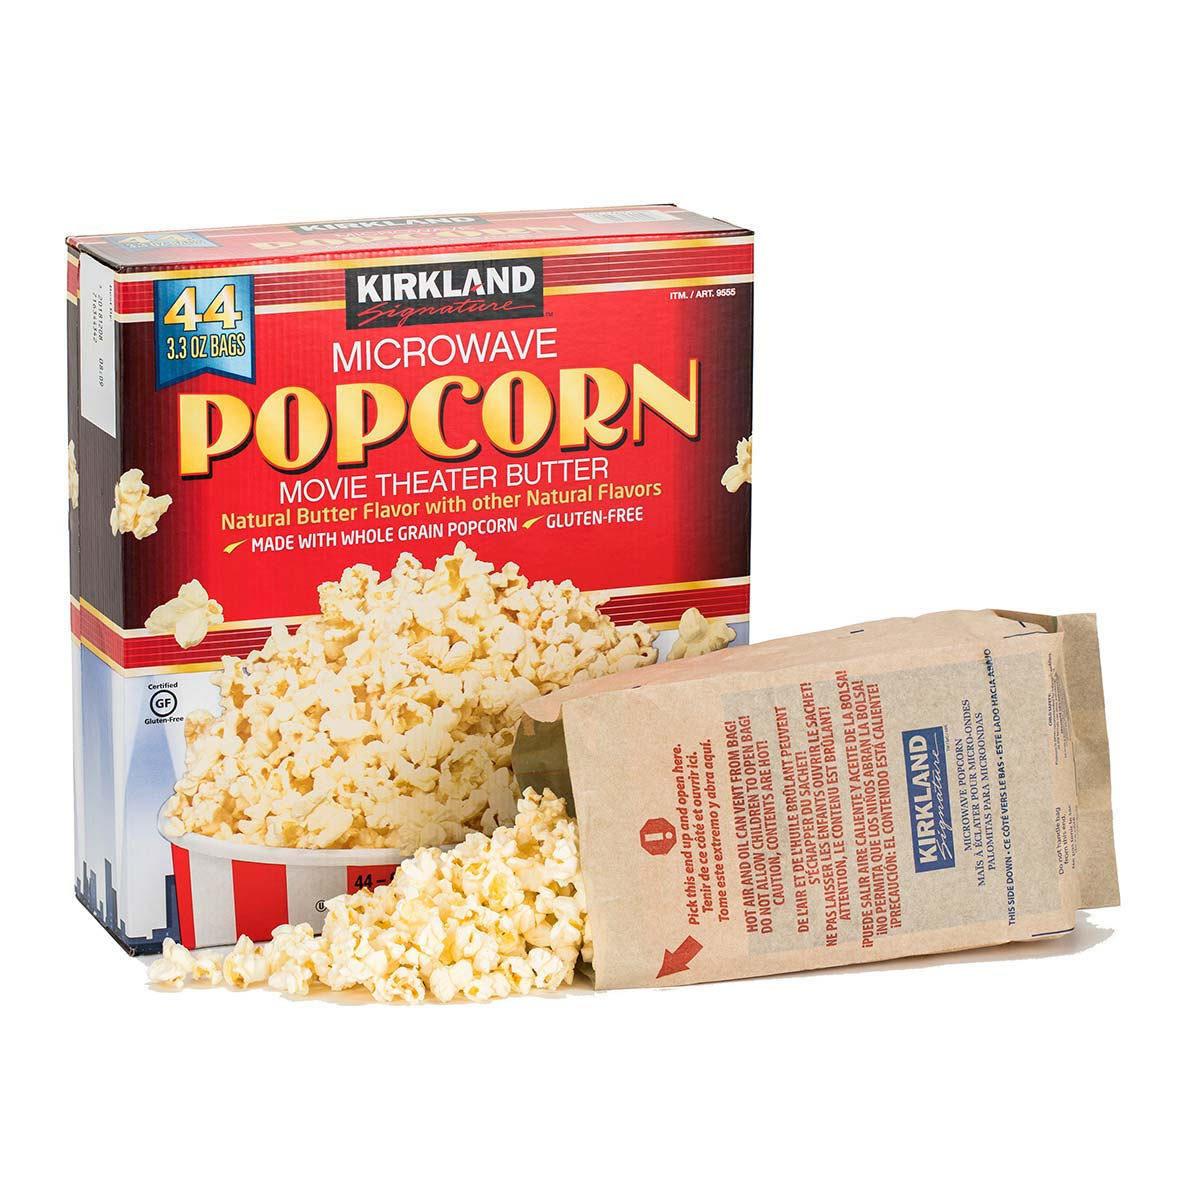 kirkland signature microwave popcorn 44 x 93g costco uk